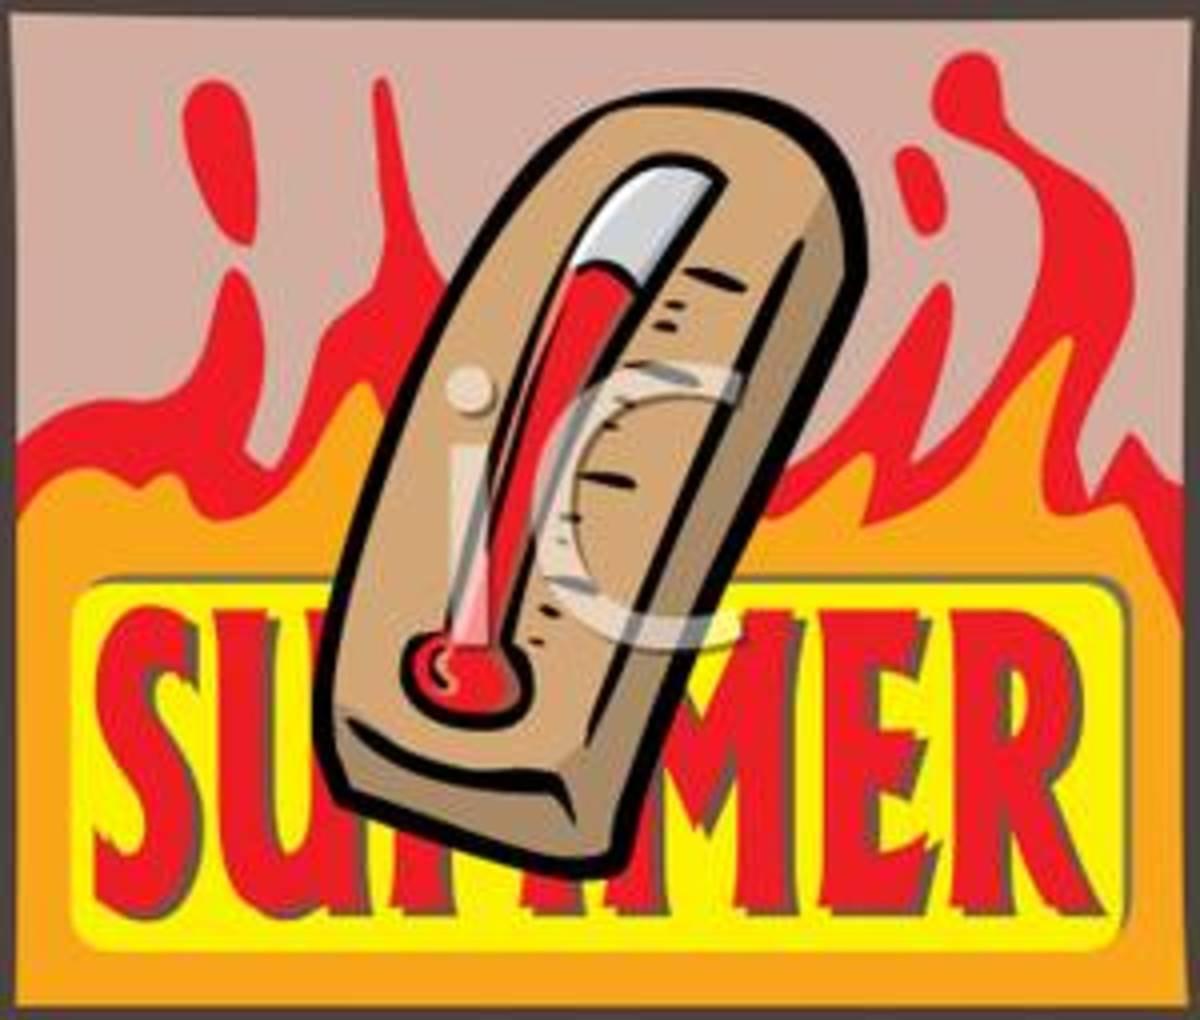 The Hot Summer